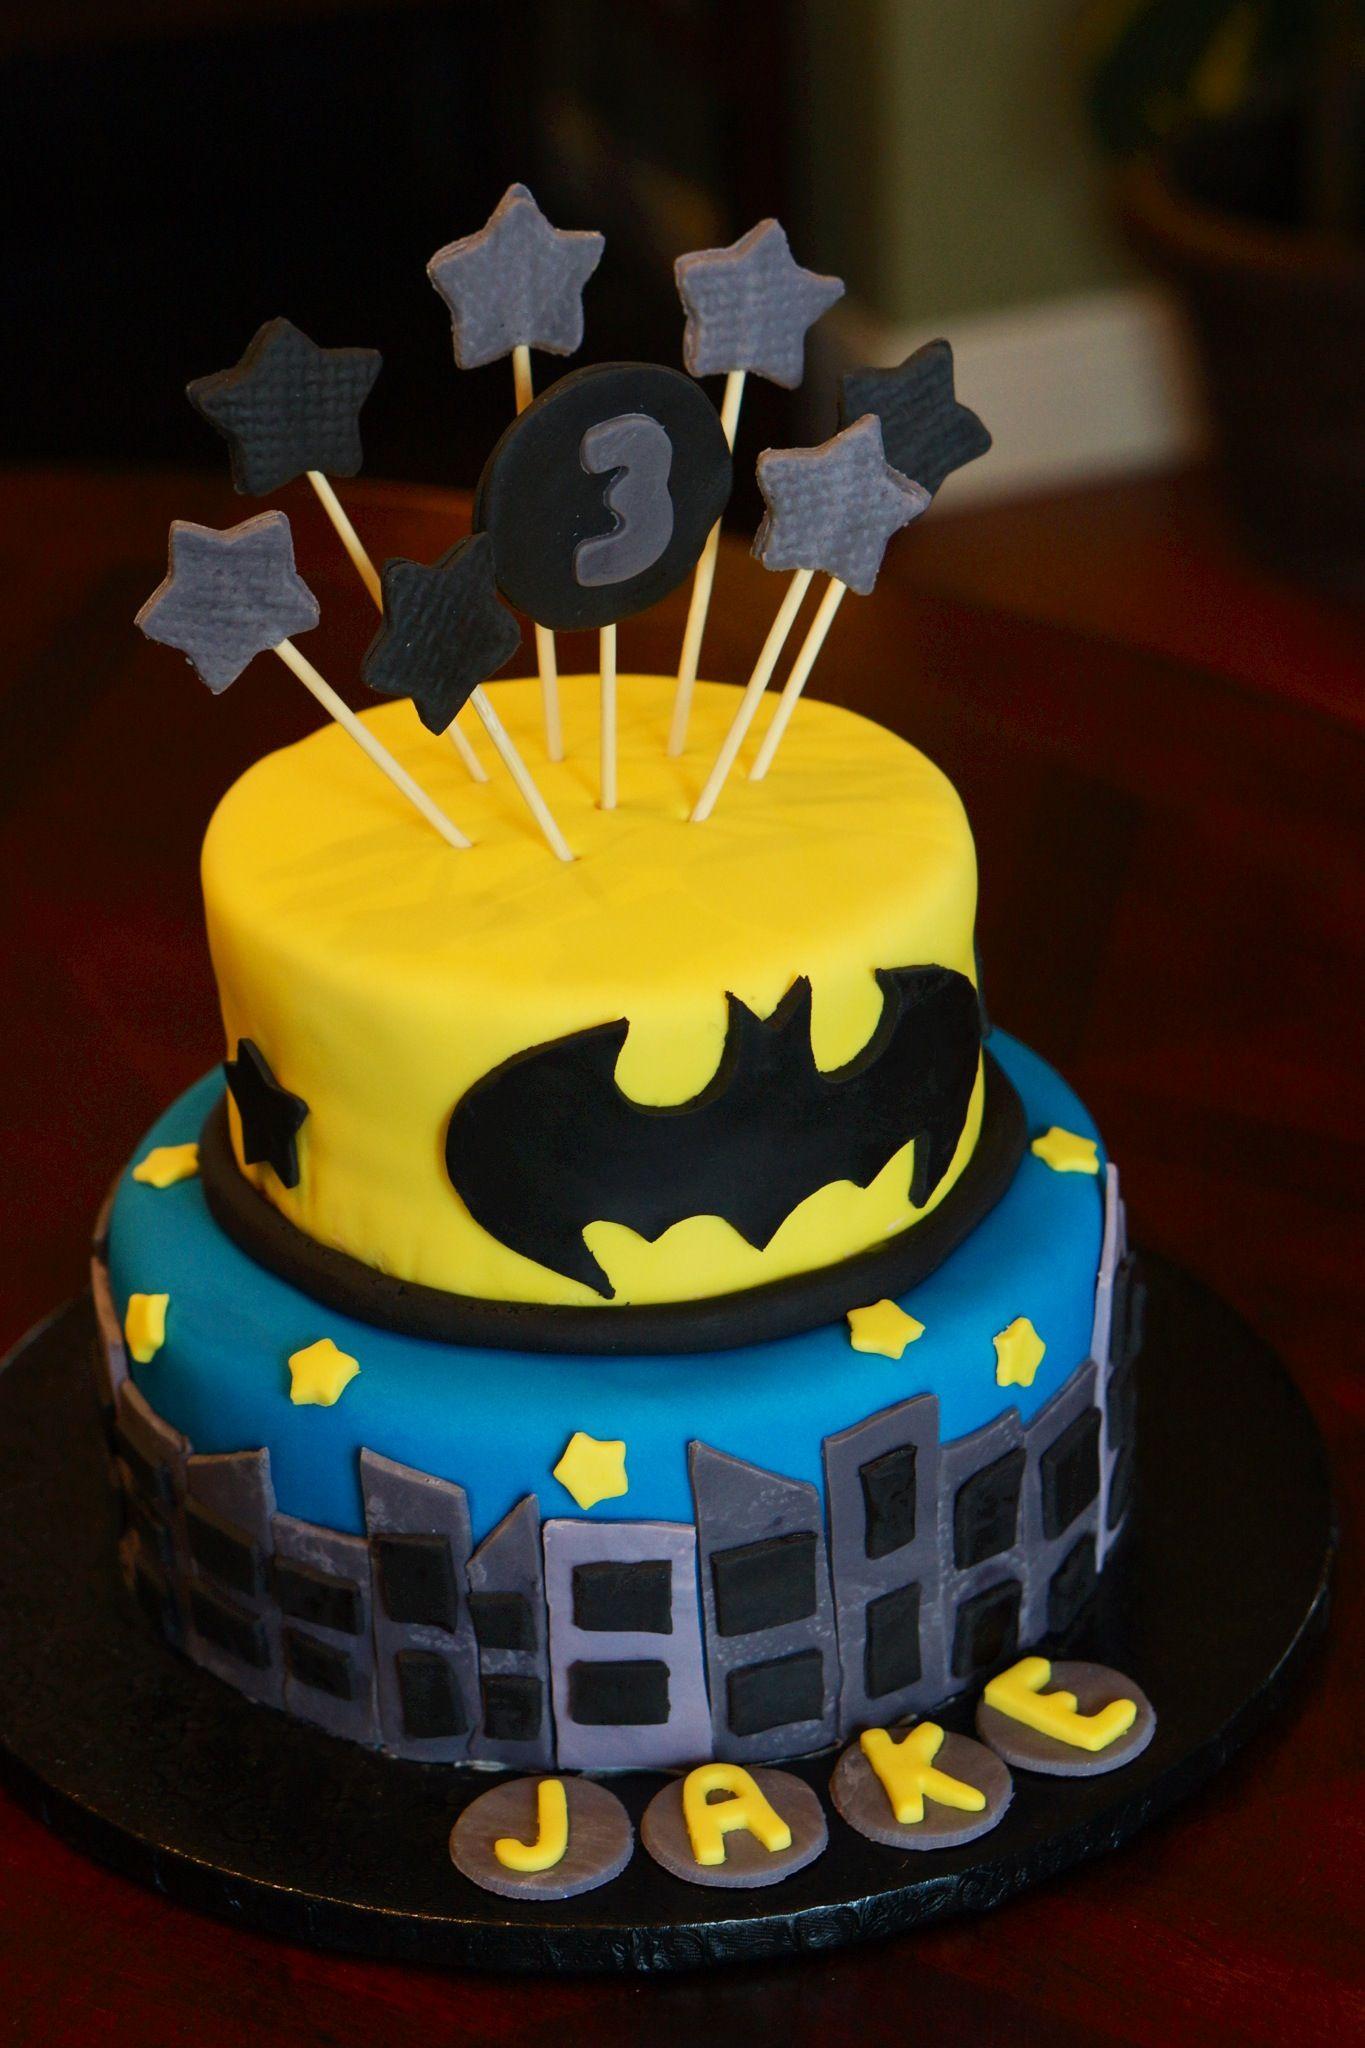 Batman cake i wanna do this for Zacharys  5th birthday lol